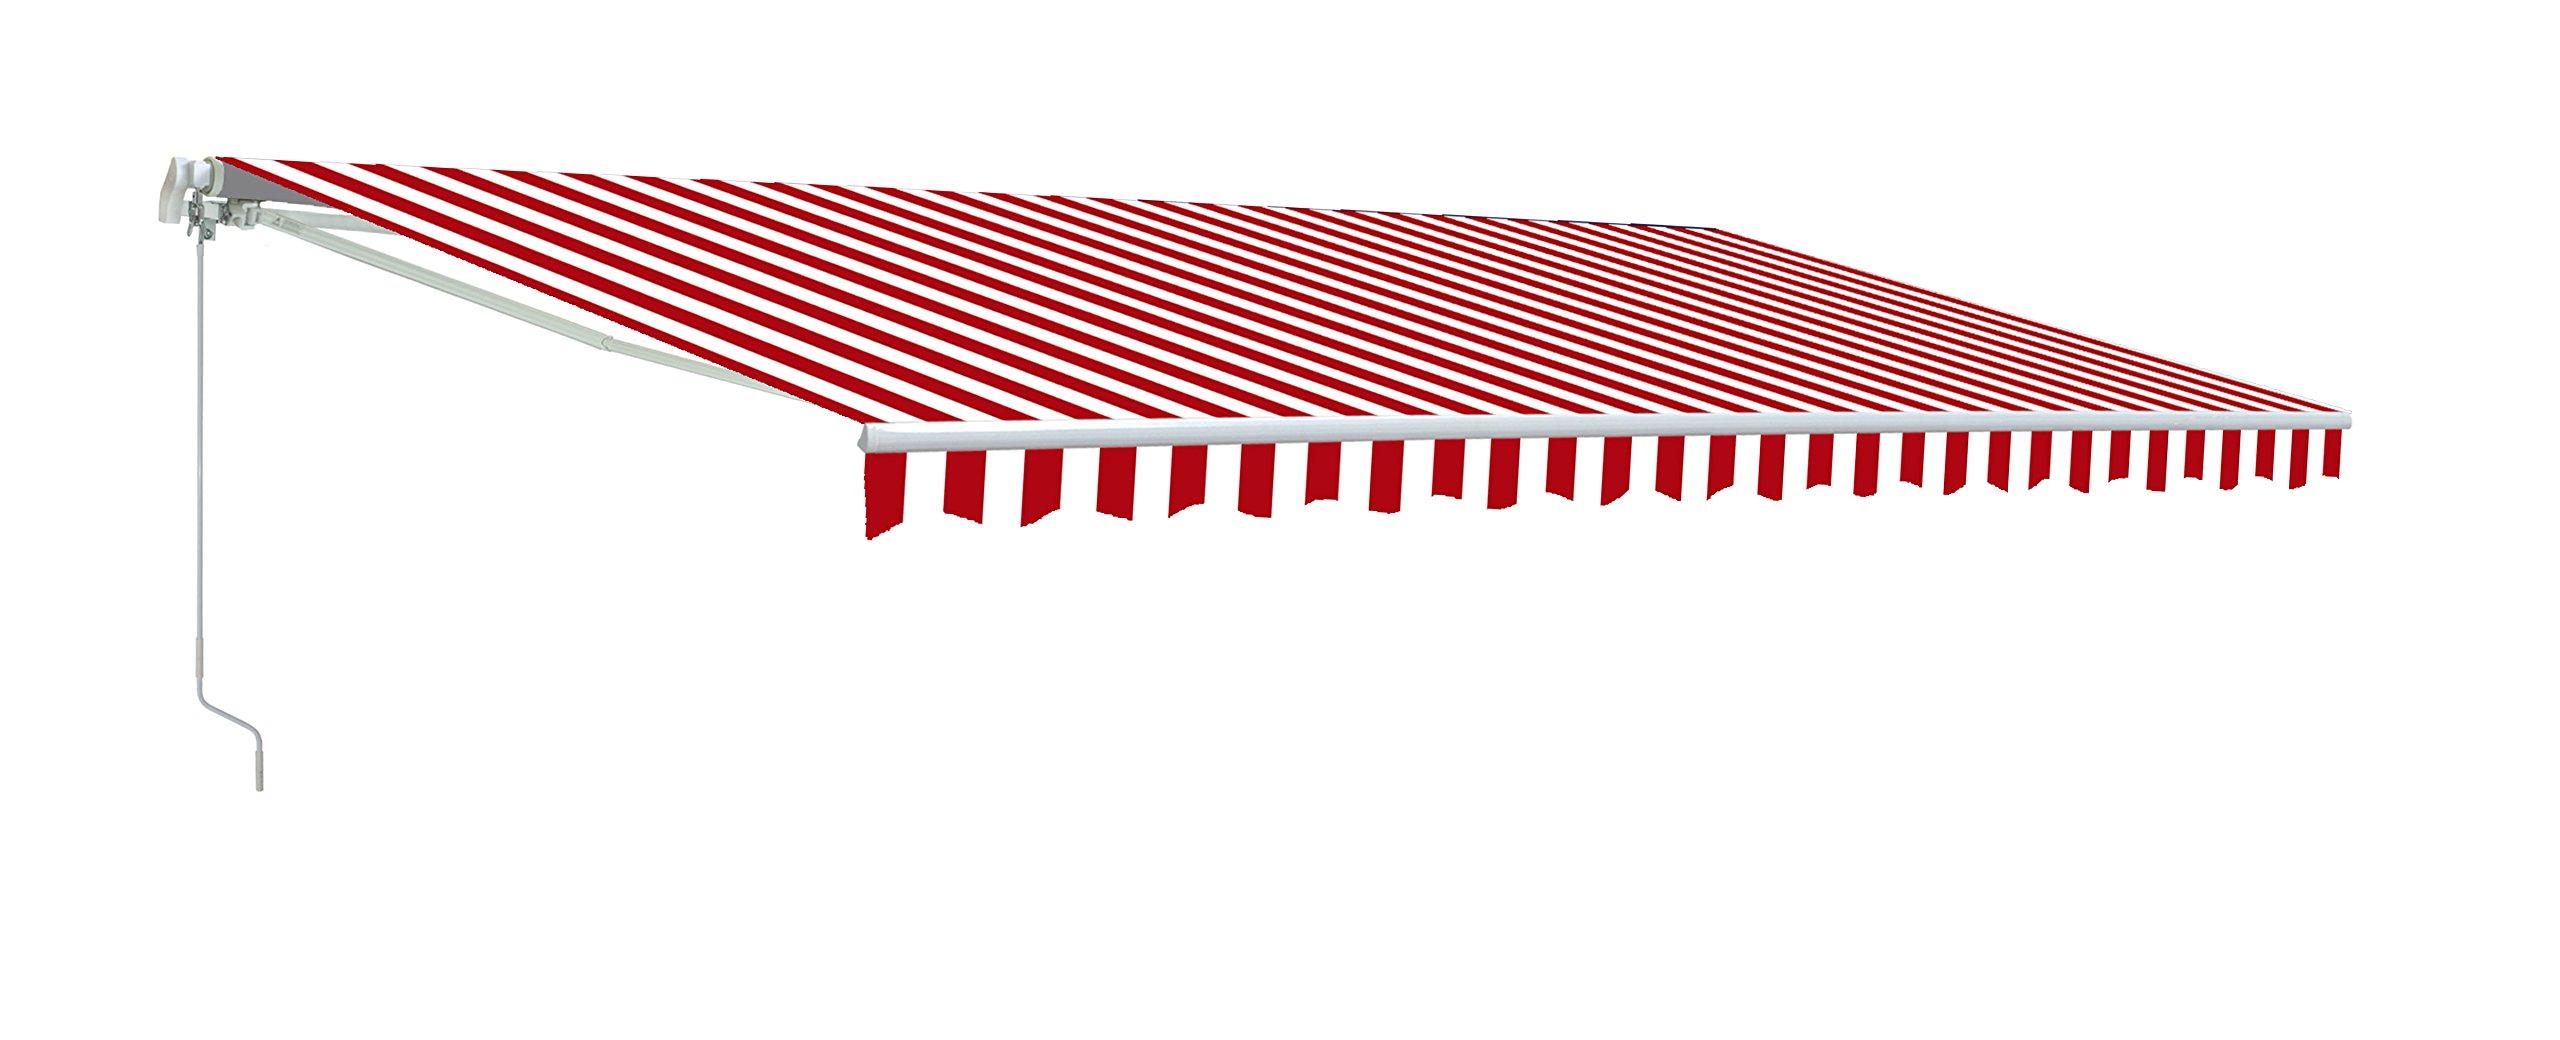 ALEKO AW10X8RWSTR05 Patio Awning, 10 by 8-Feet/3m by 2.5m, Red and White Stripes